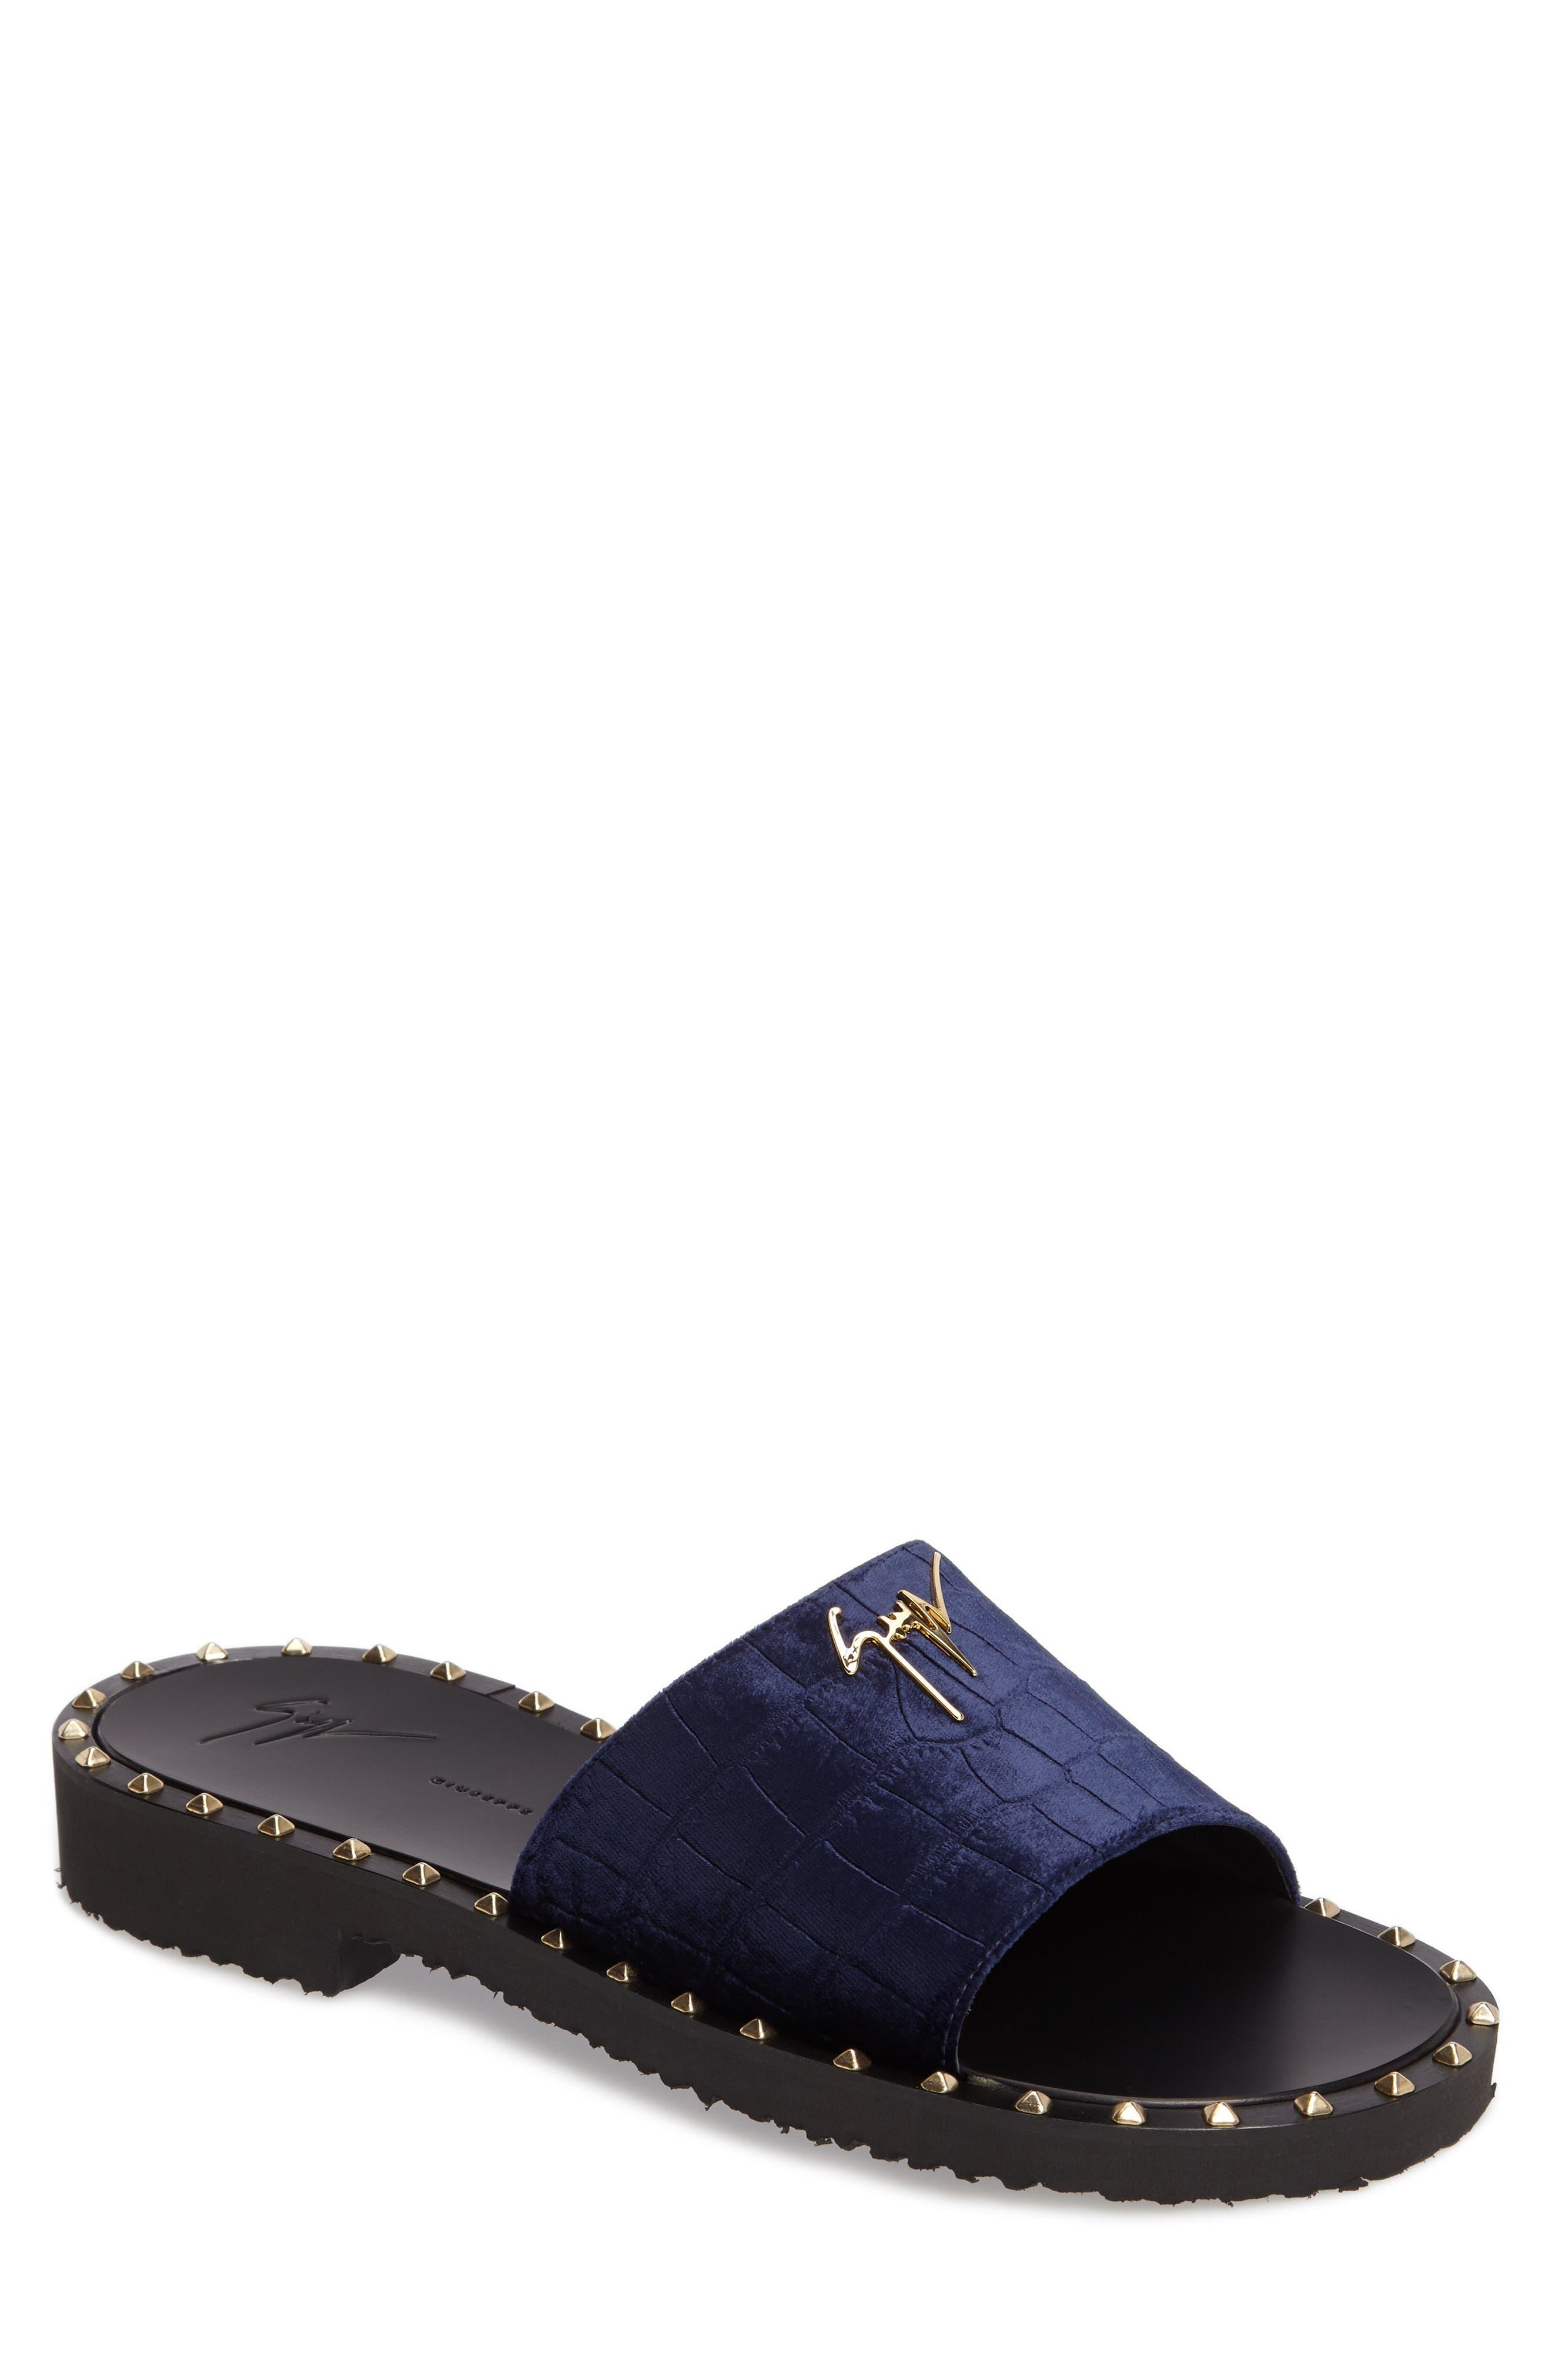 Studded Slide Sandal,                             Main thumbnail 1, color,                             400